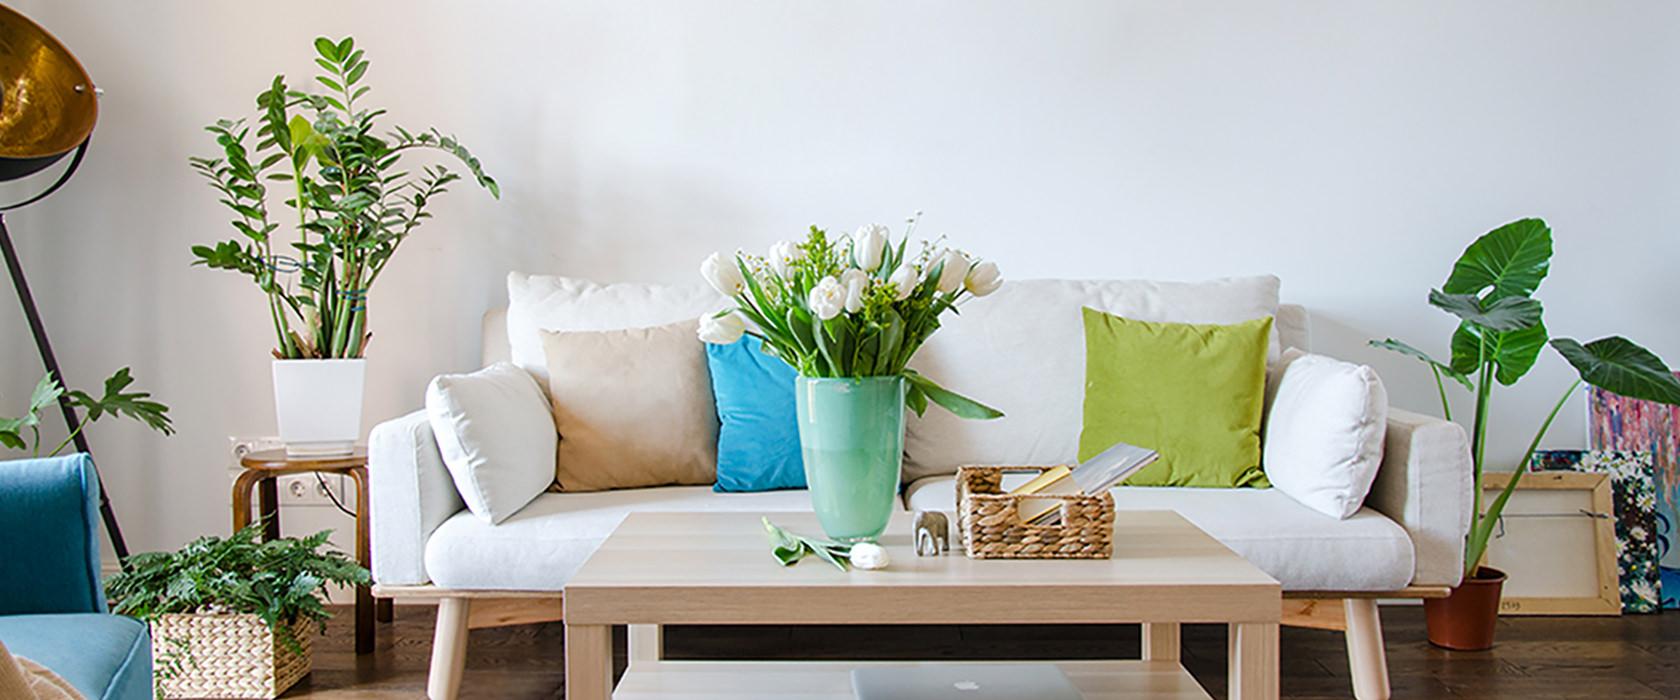 Тримісний диван Niccolo - Фото 1 - Pufetto